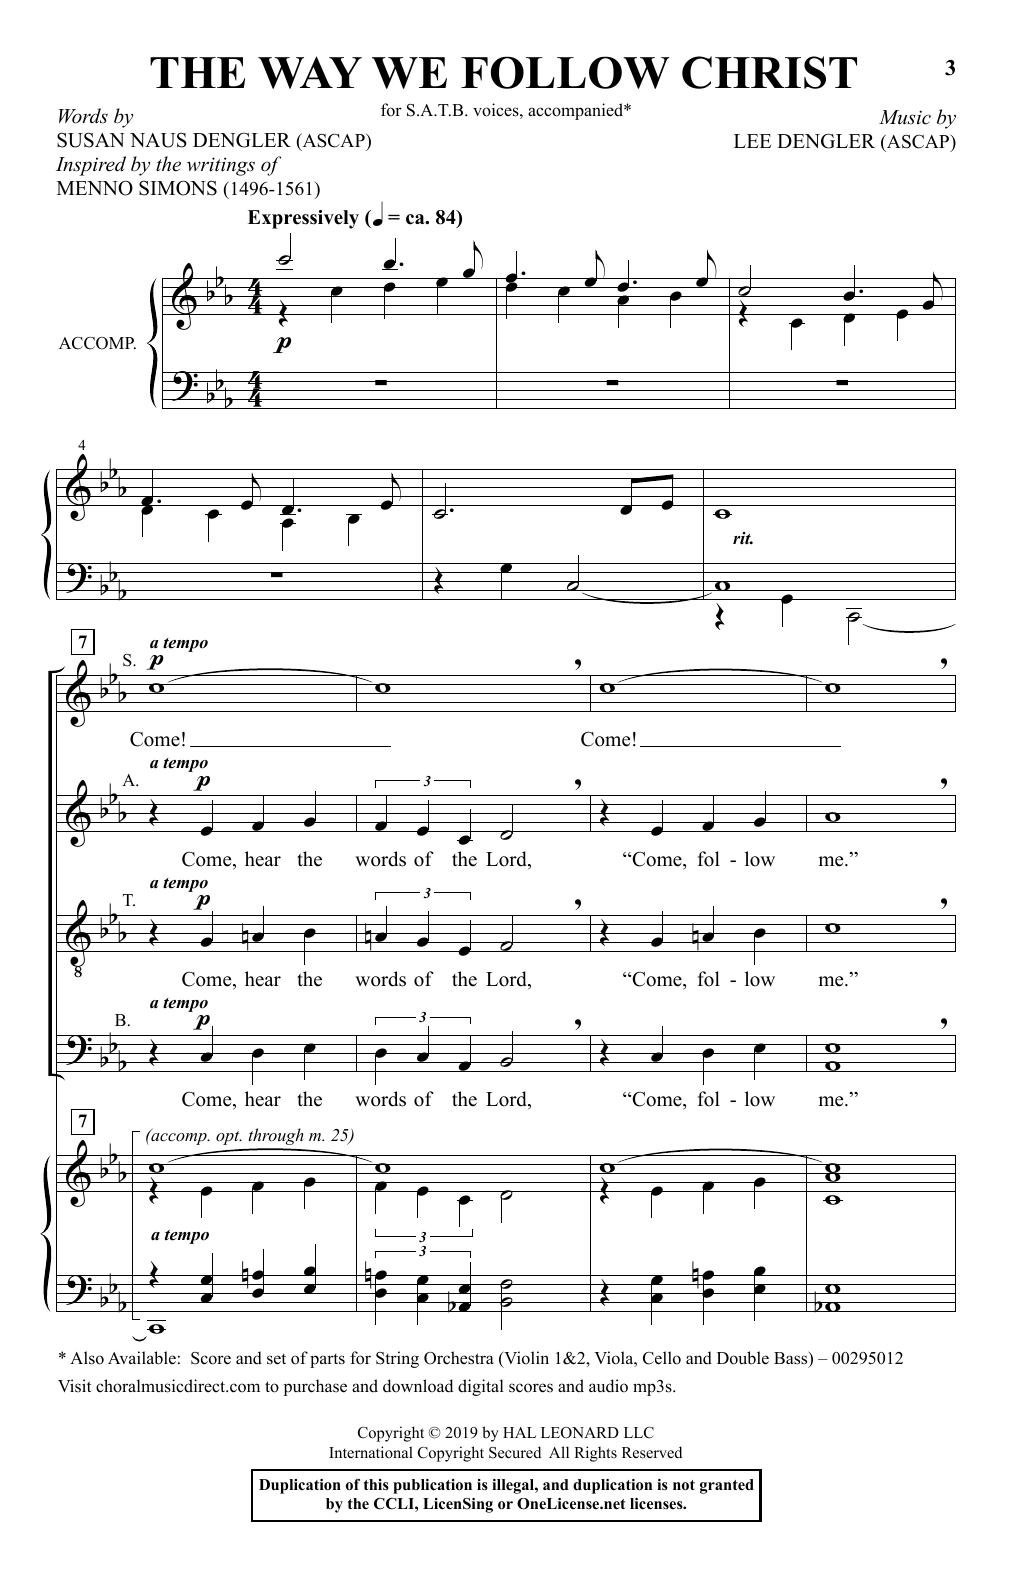 The Way We Follow Christ (SATB Choir)